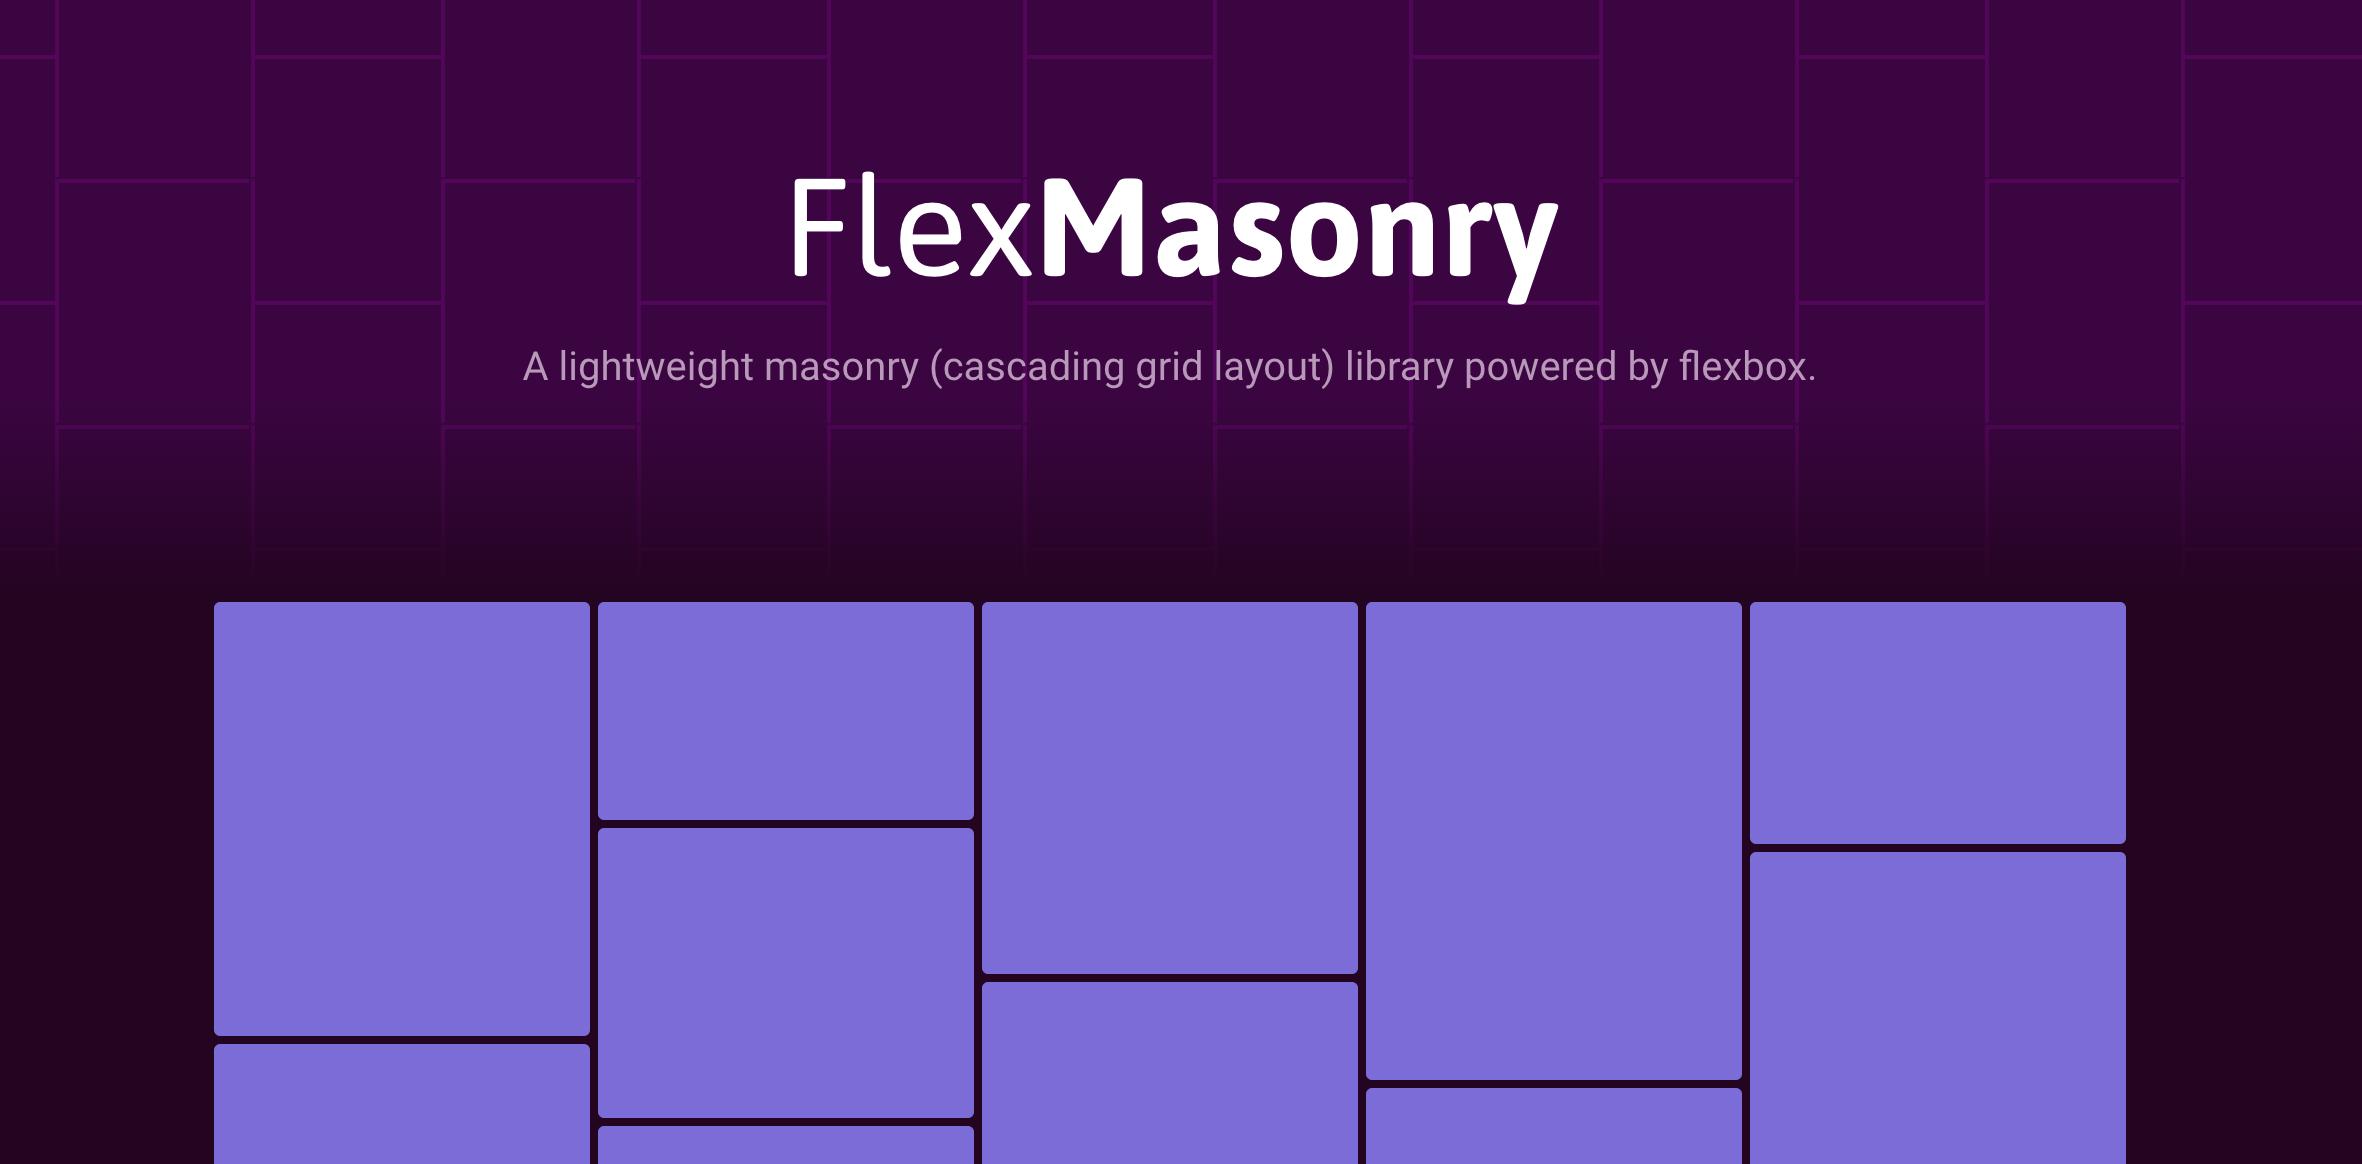 FlexMasonry